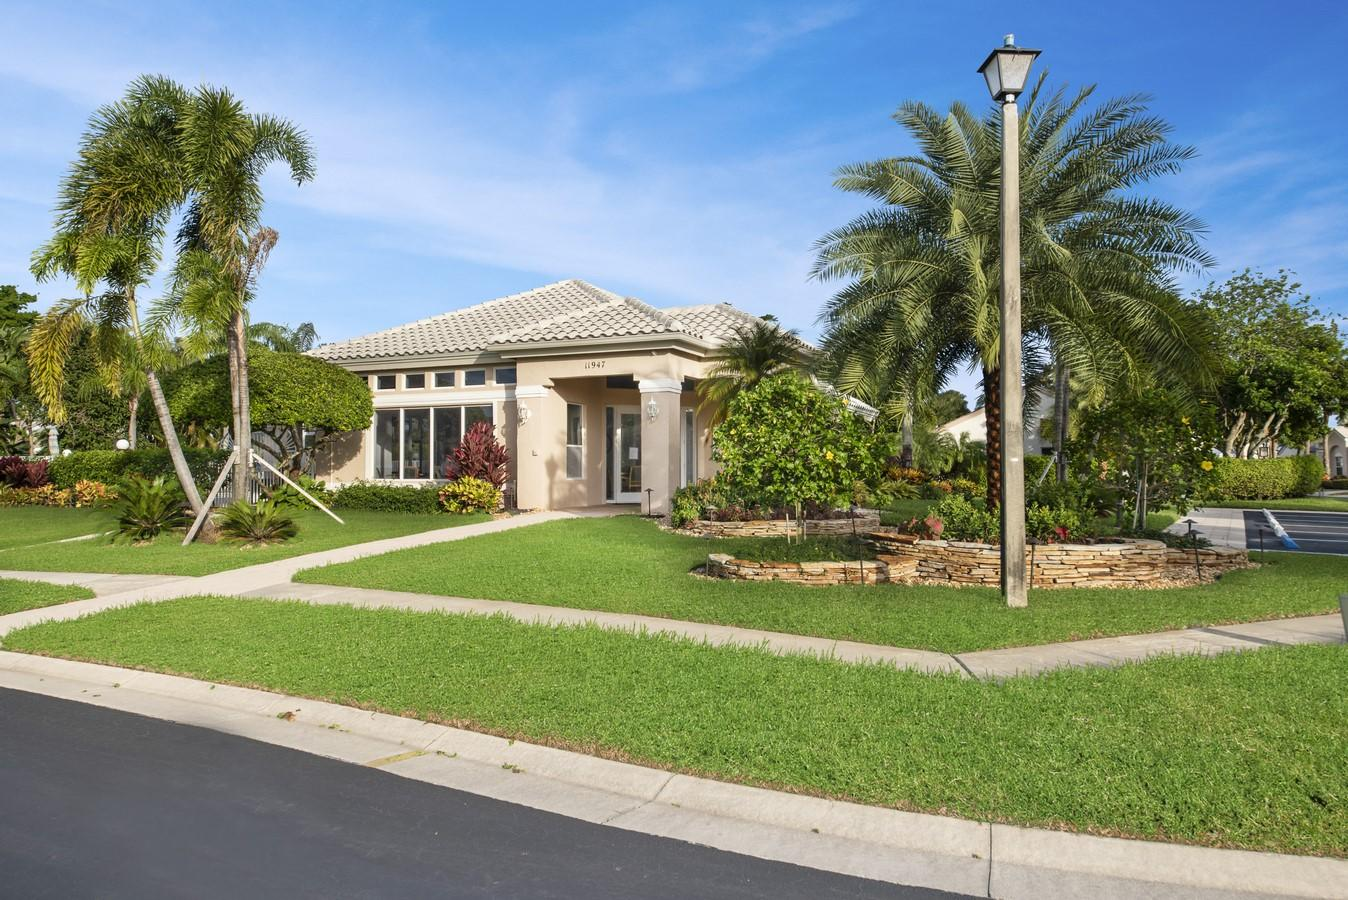 11817 Fountainside Circle Boynton Beach, FL 33437 photo 51